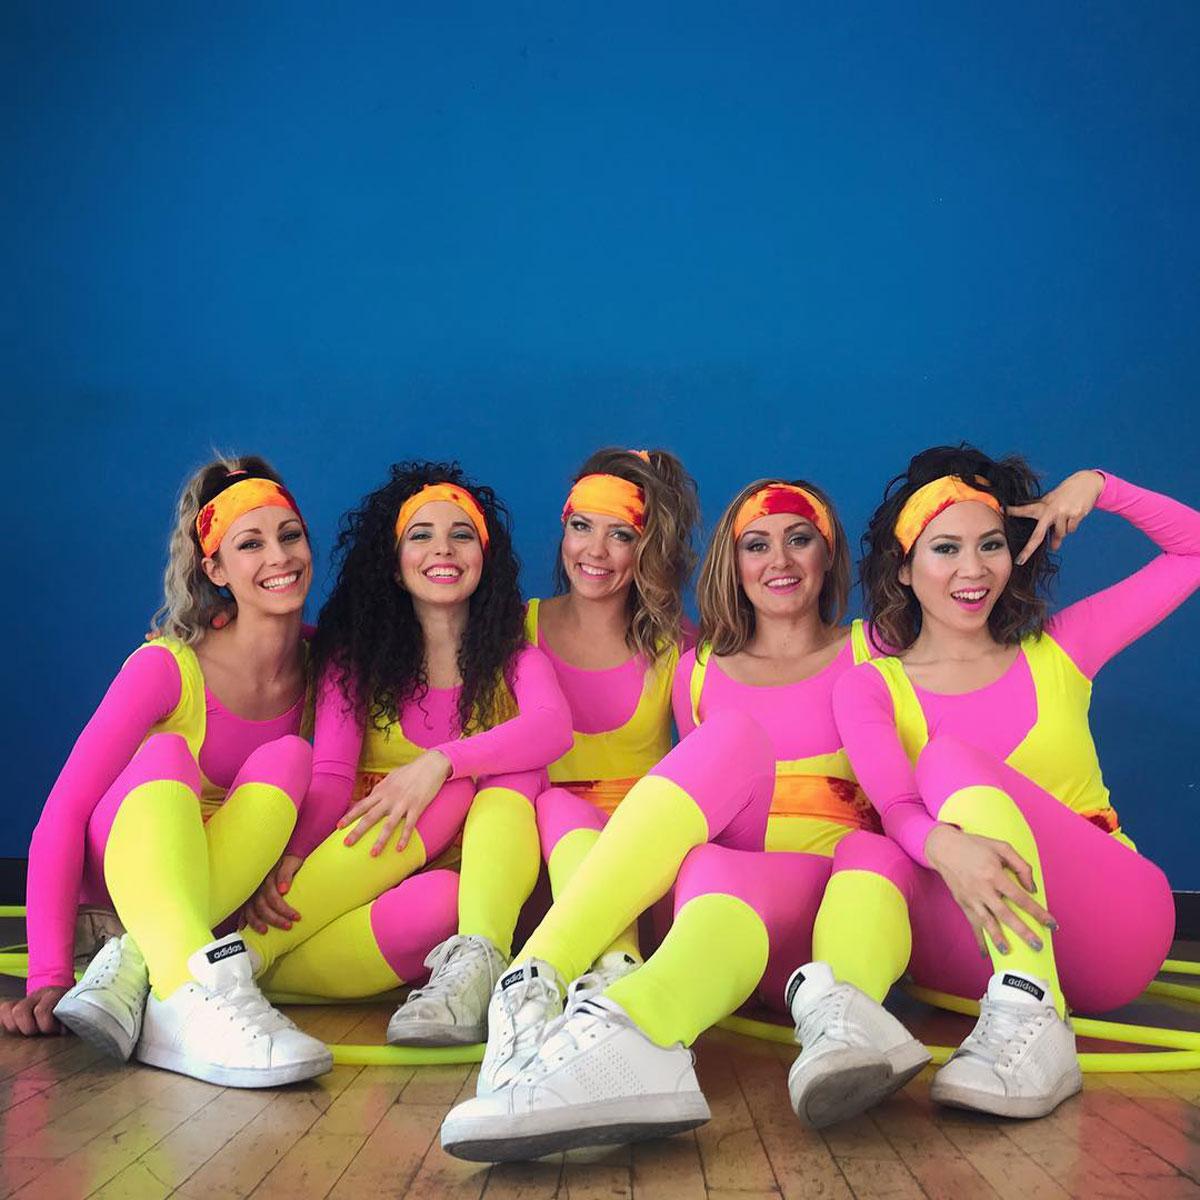 Hula Hoop Dancers wearing colored dancewear sitting at a dance studio